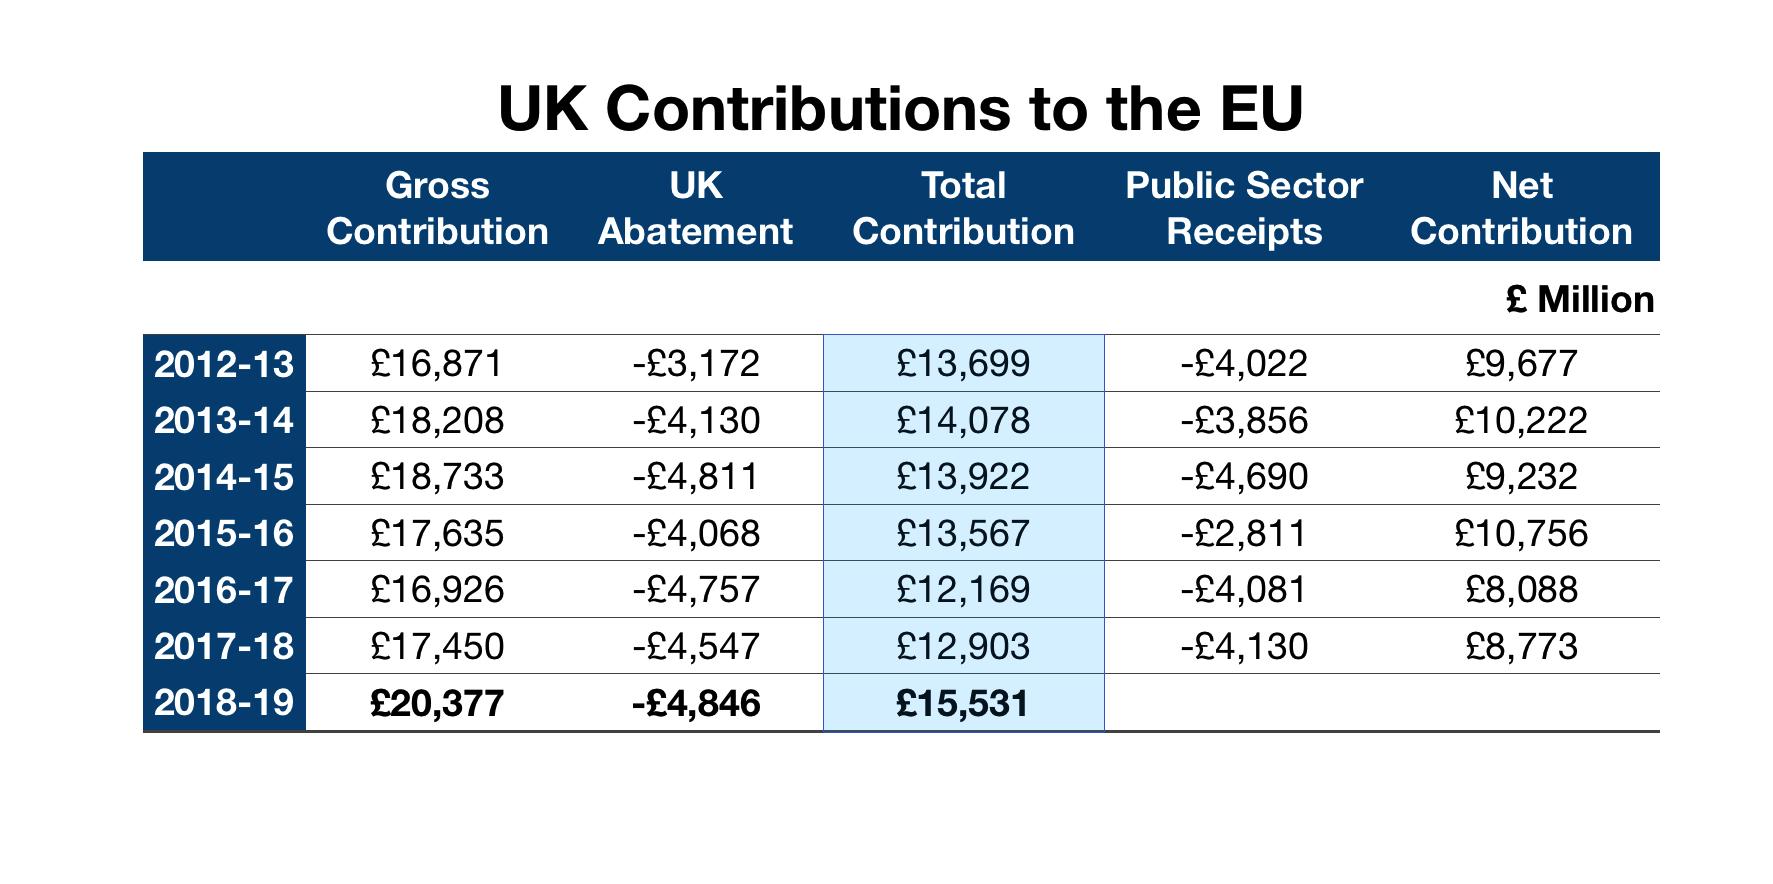 UK to EU Contributions 2012-2019